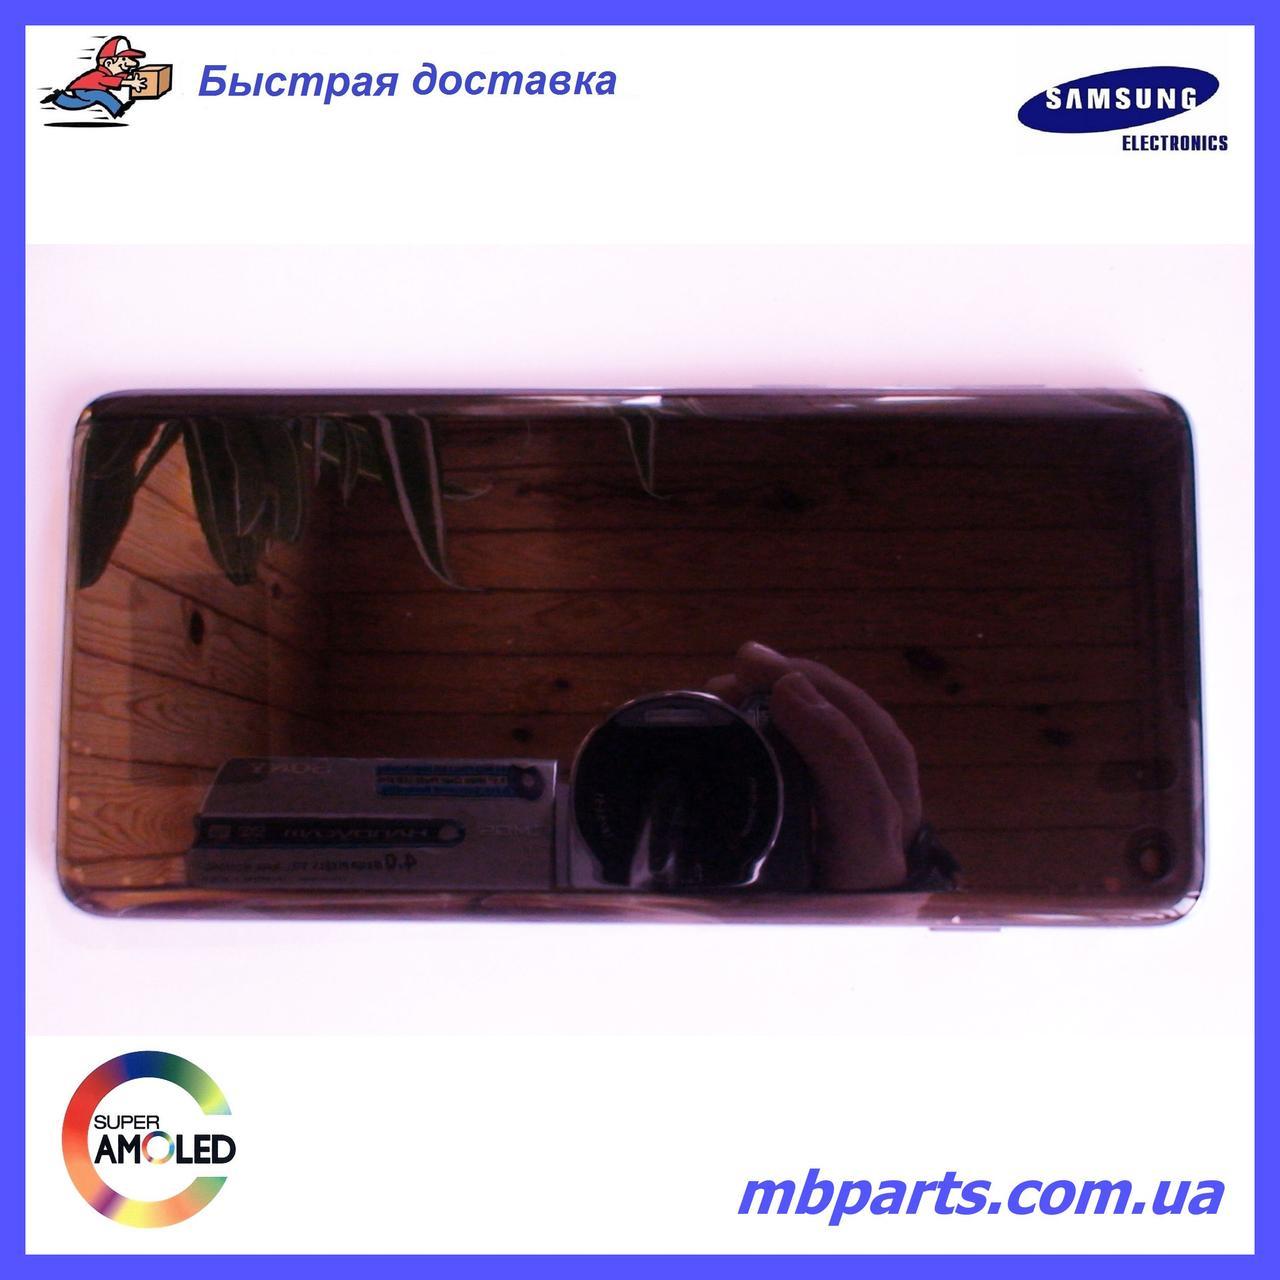 Дисплей с сенсором Samsung G973 Galaxy S10  White, GH82-18850B, оригинал!